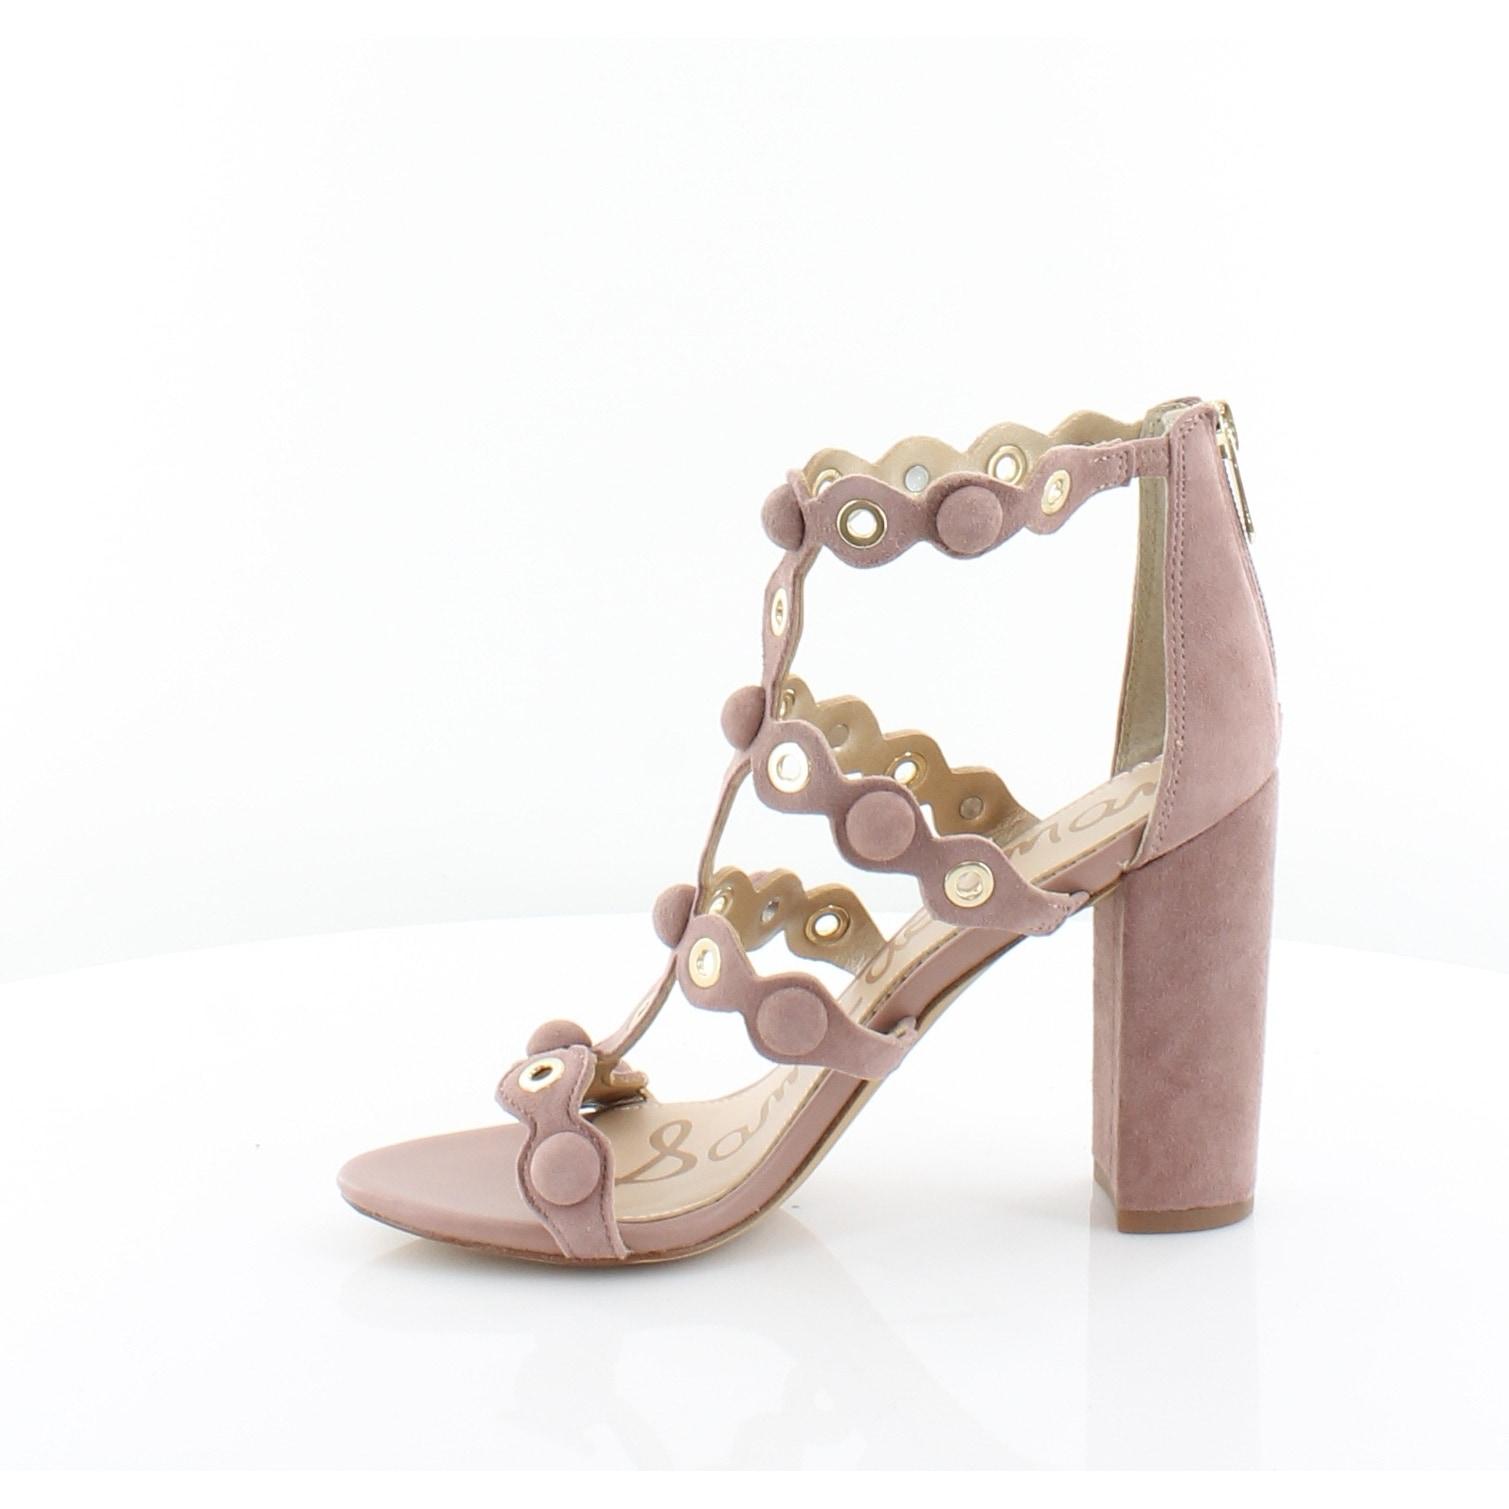 186b3a7c9393 Shop Sam Edelman Yuli Women s Heels Dusty Rose - 7 - Free Shipping Today -  Overstock - 25781981